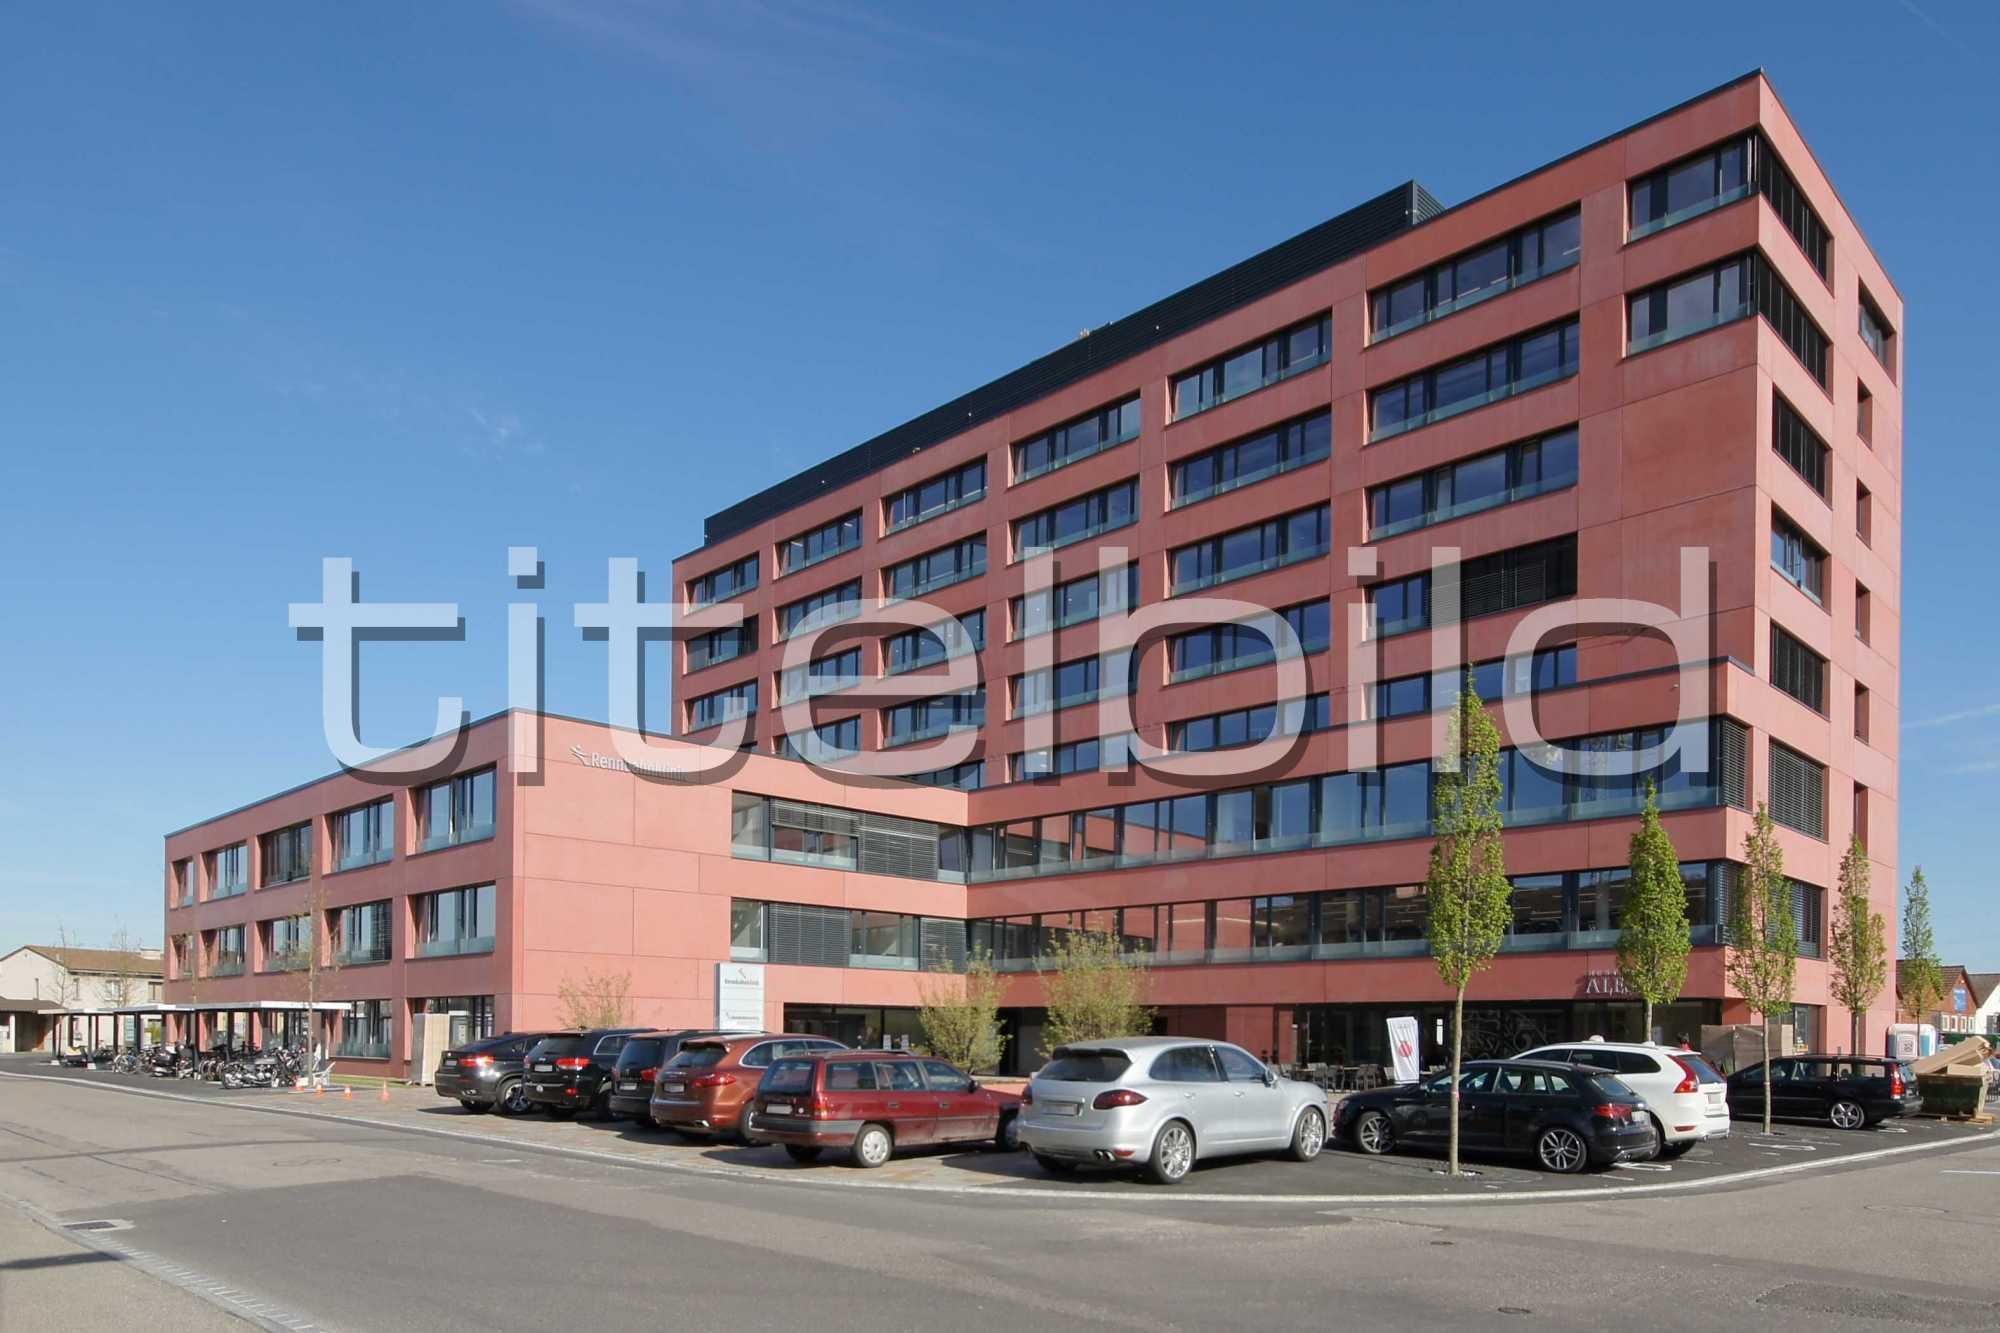 Projektbild-Nr. 2: Praxisklinik Rennbahn, Muttenz